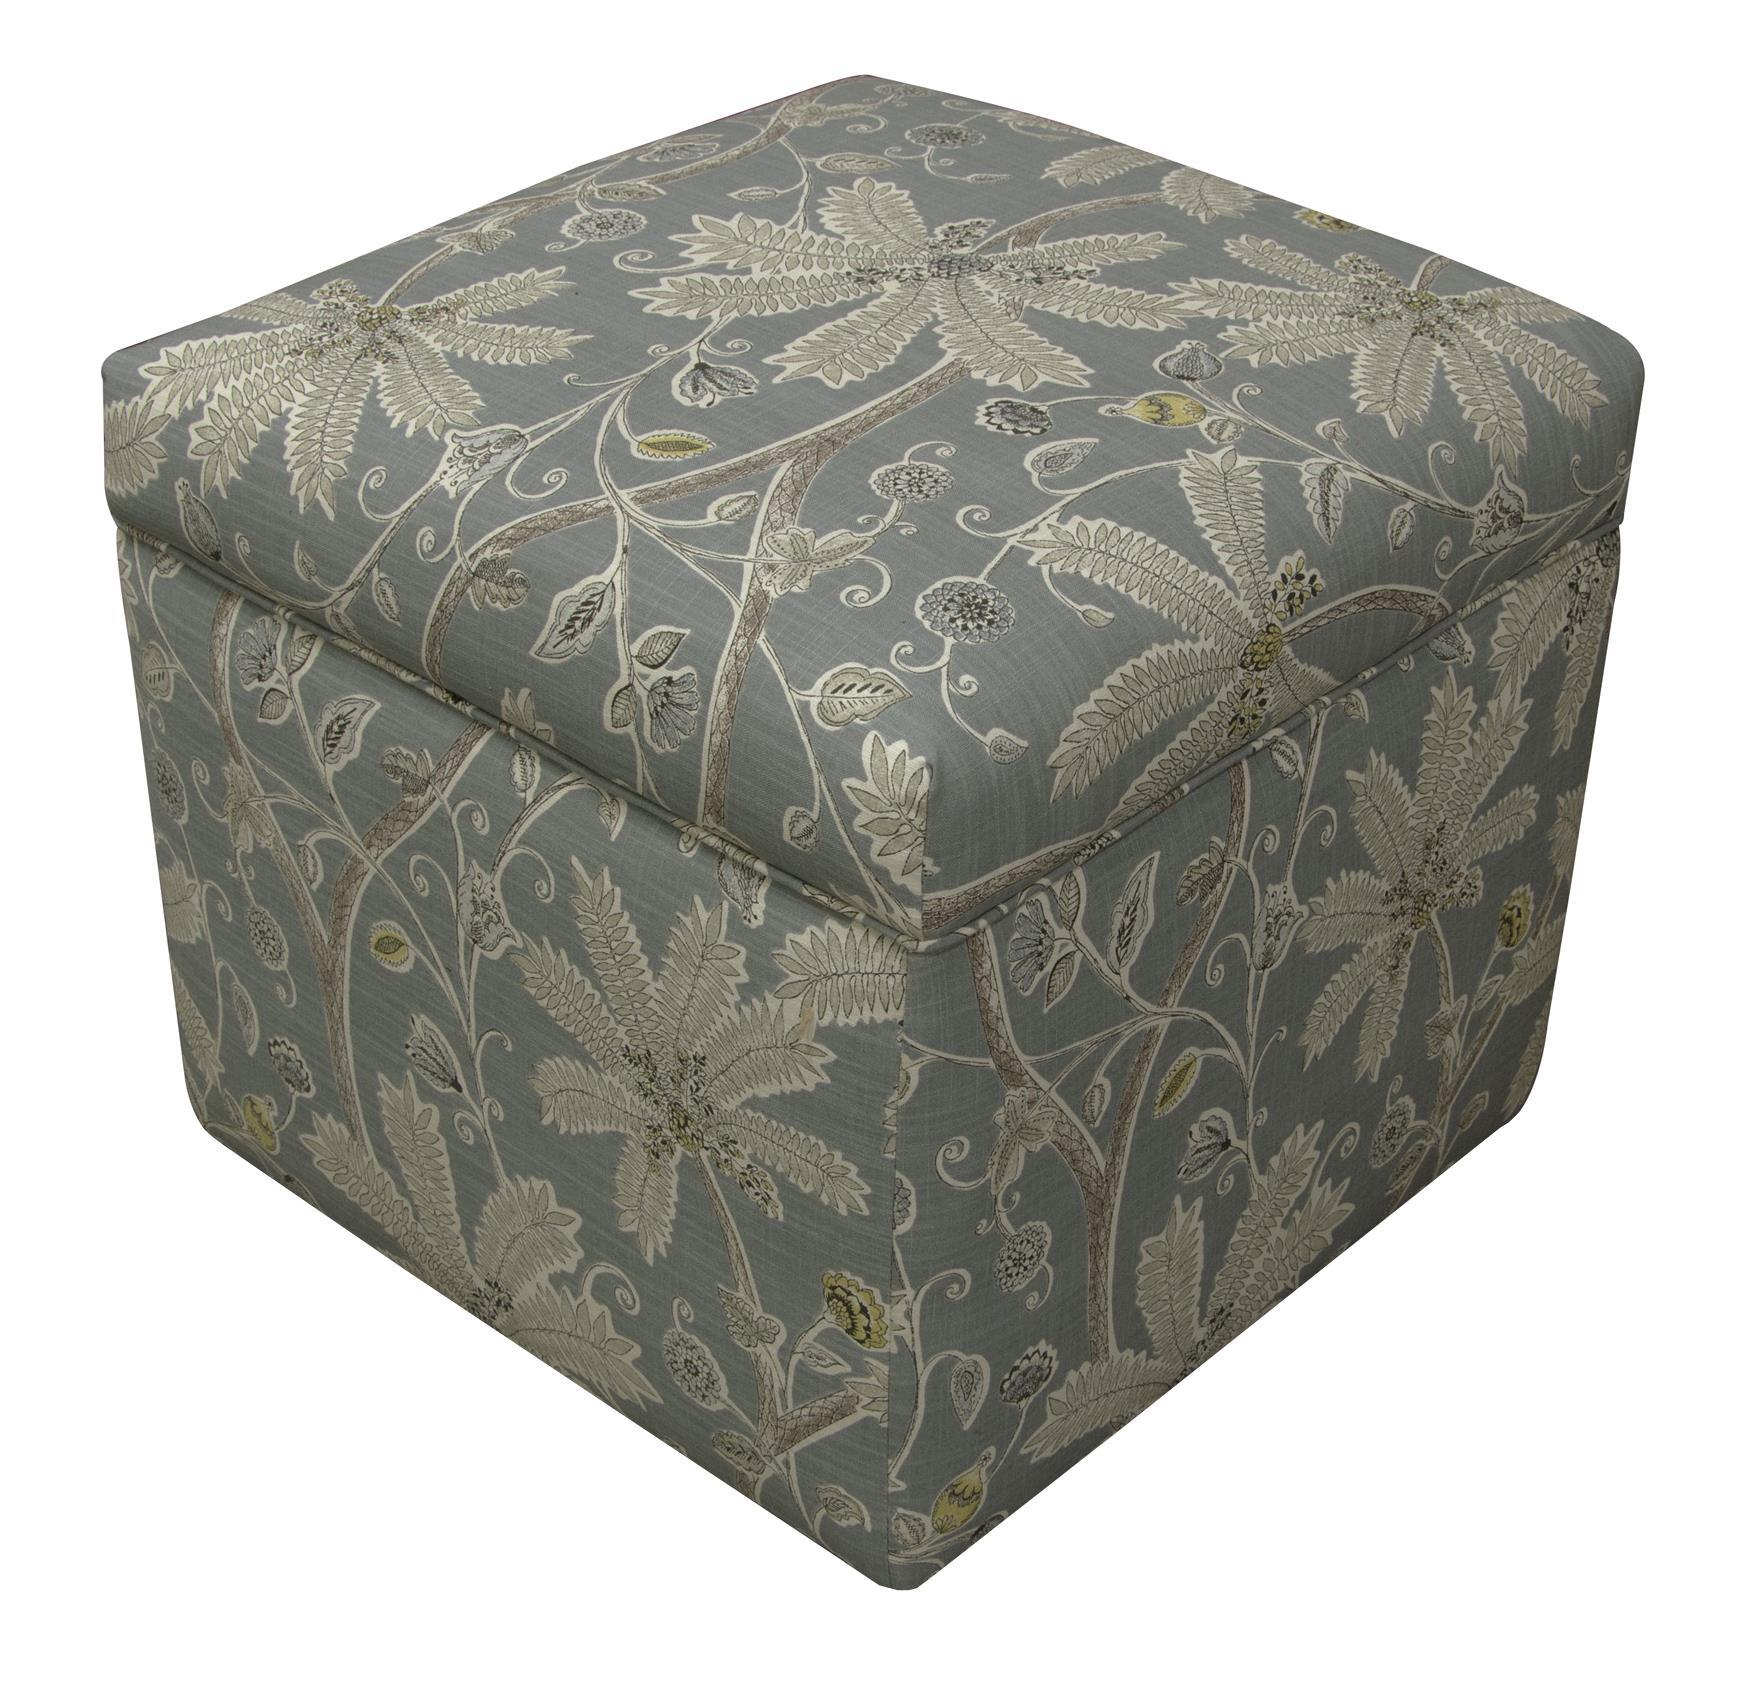 Parson Storage Ottoman by England at Suburban Furniture